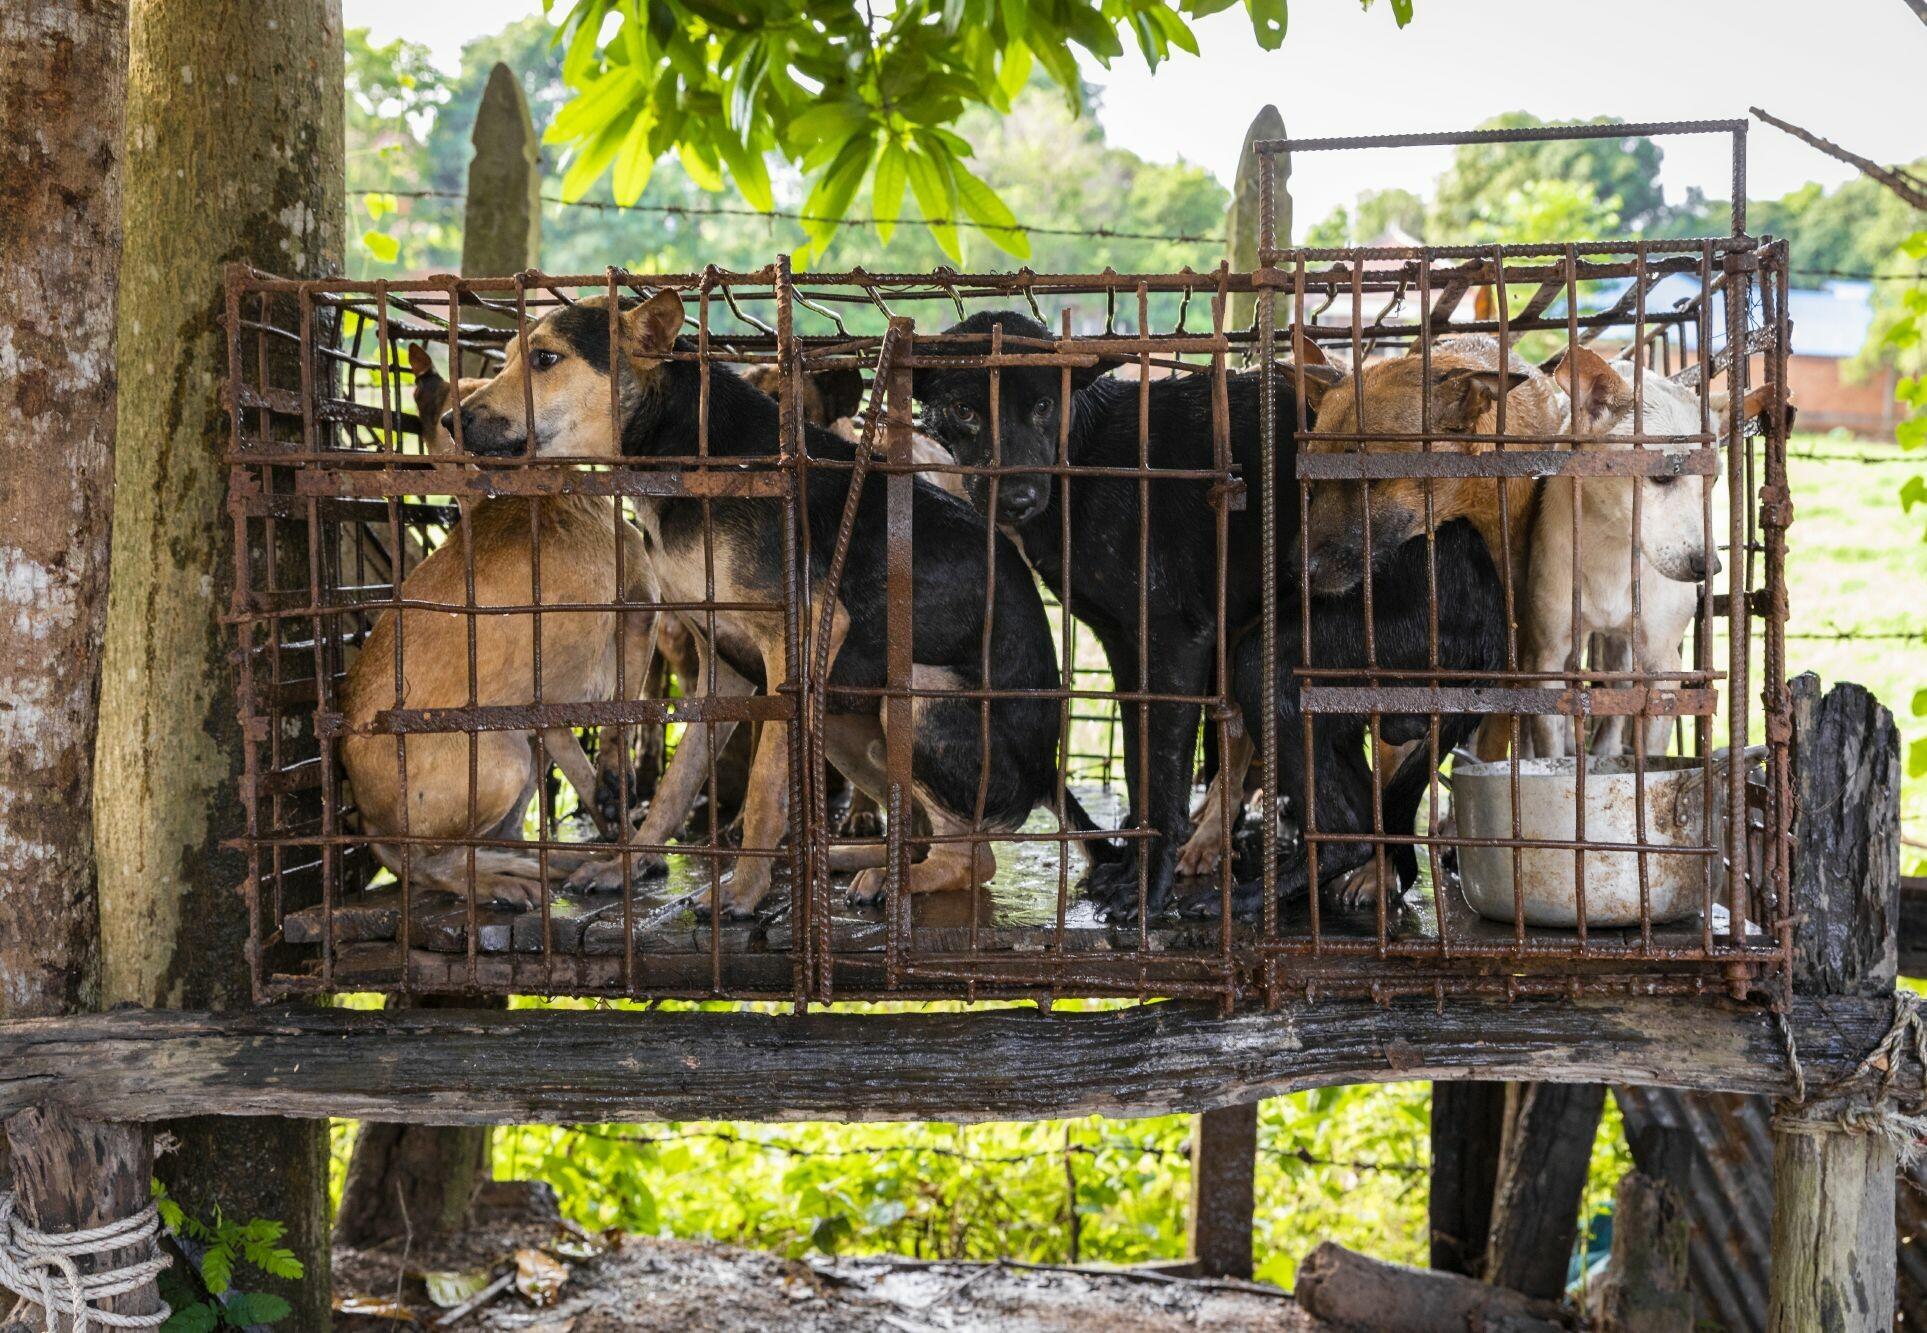 Dog slaughterhouse in Siem Reap, Cambodia